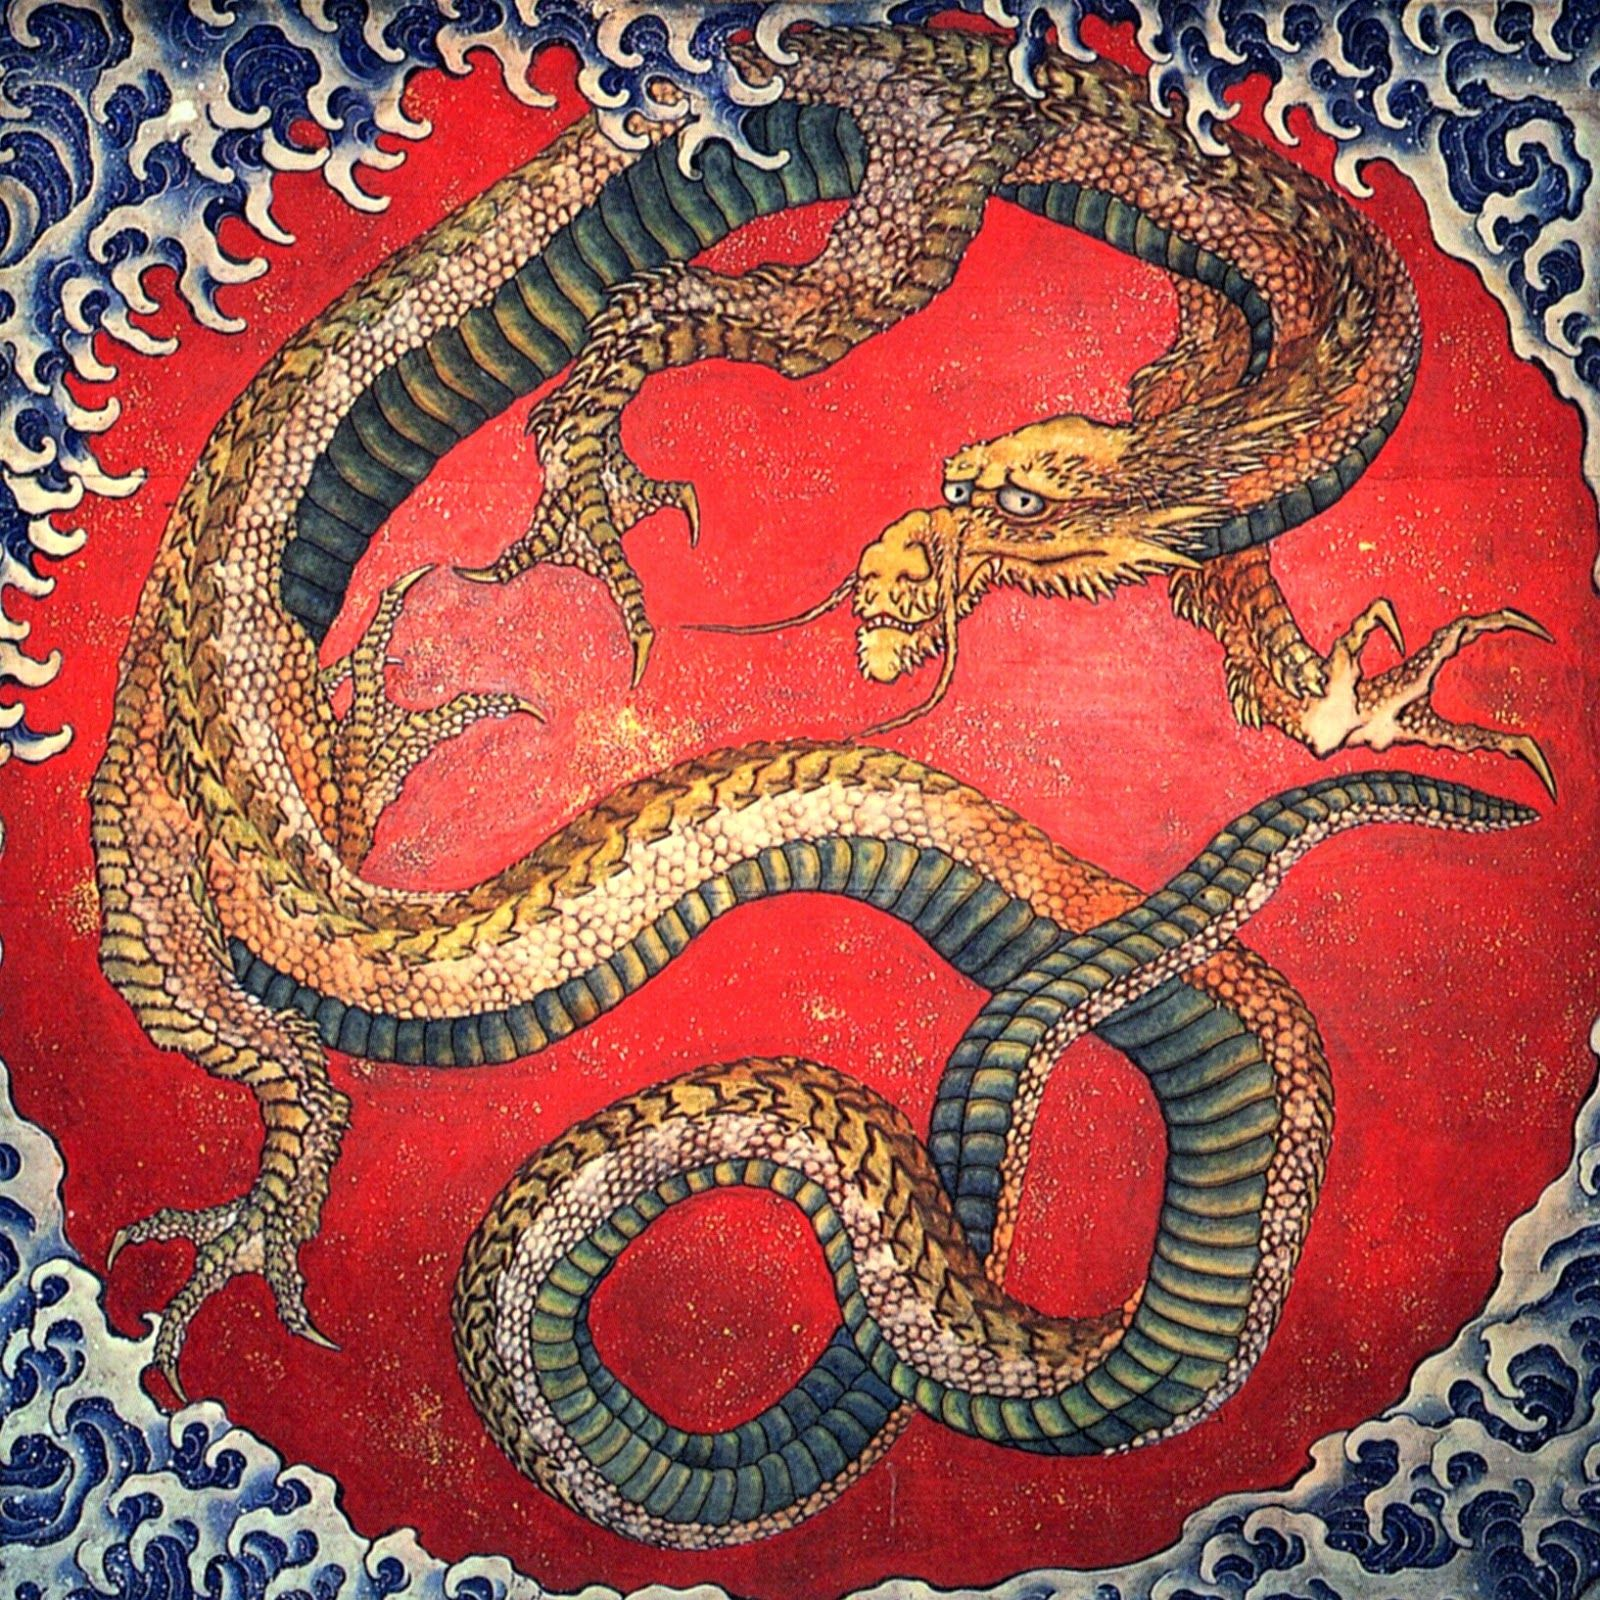 Drago Giapponese  Dipinto di HOKUSAI Aikidō Iwama Ryū Napoli  O'Sensei e lo Spirito del Re Drago